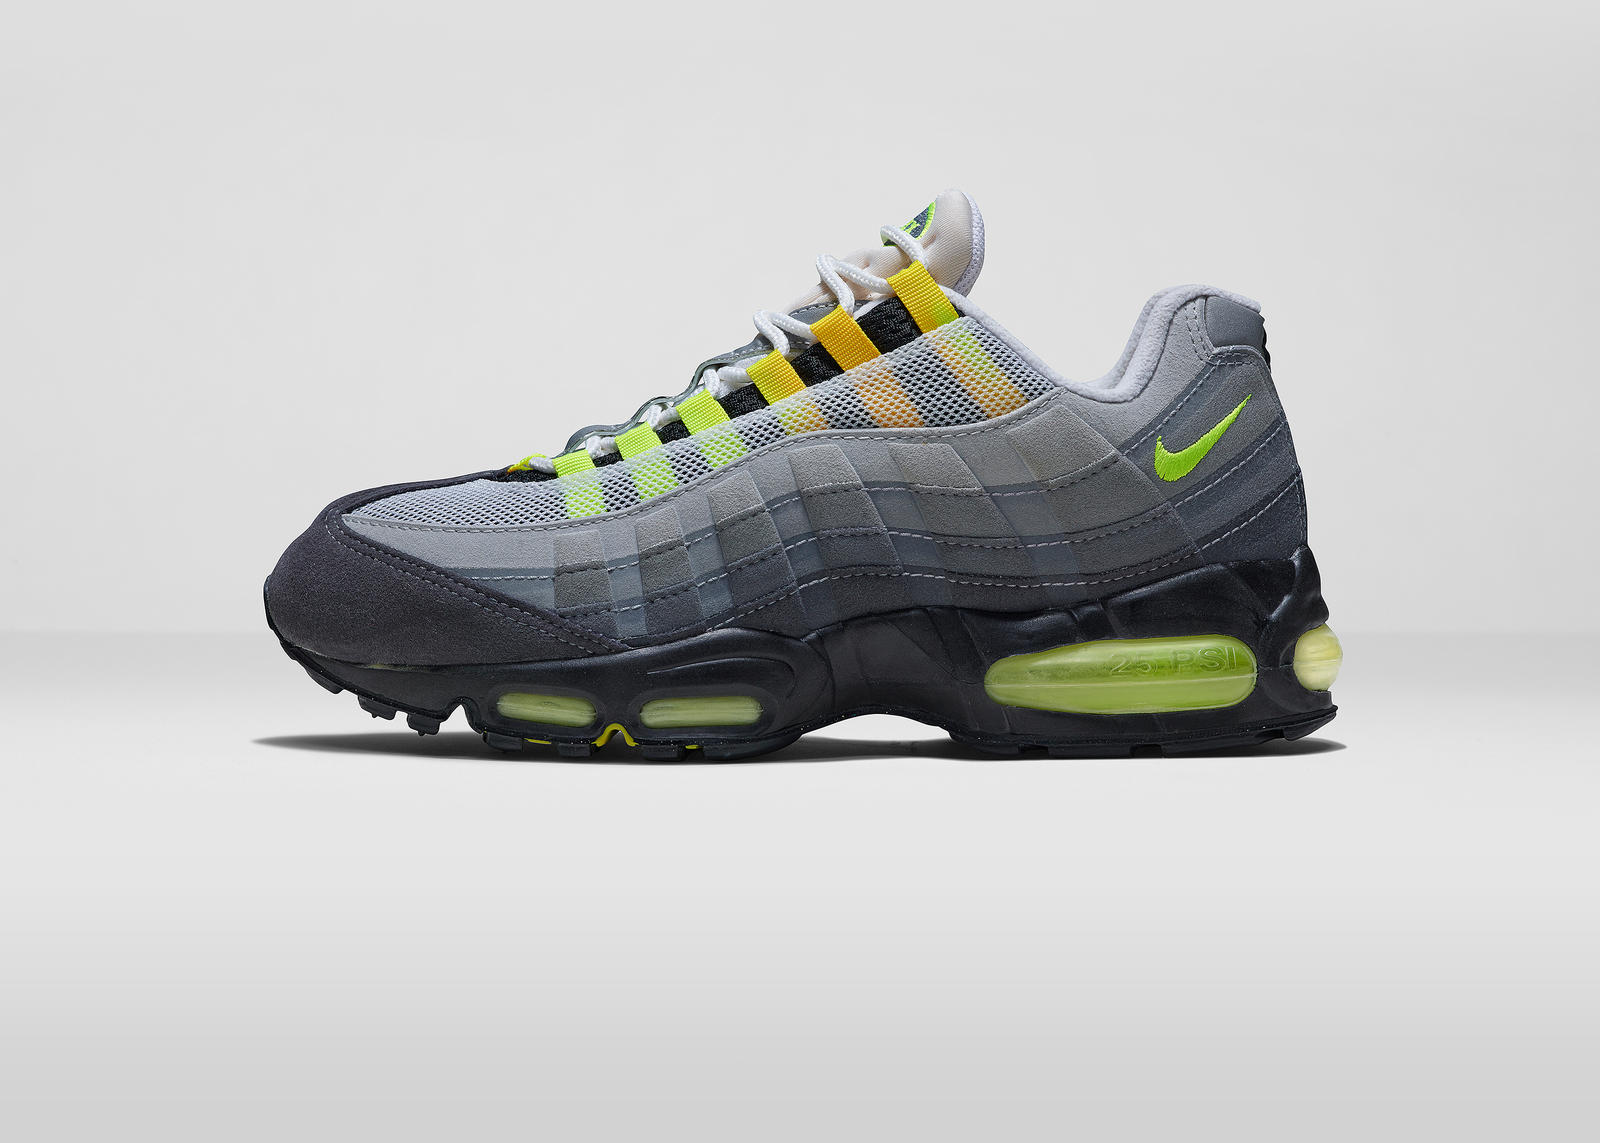 Nike_AirMaxDay_2015_1995_LAT